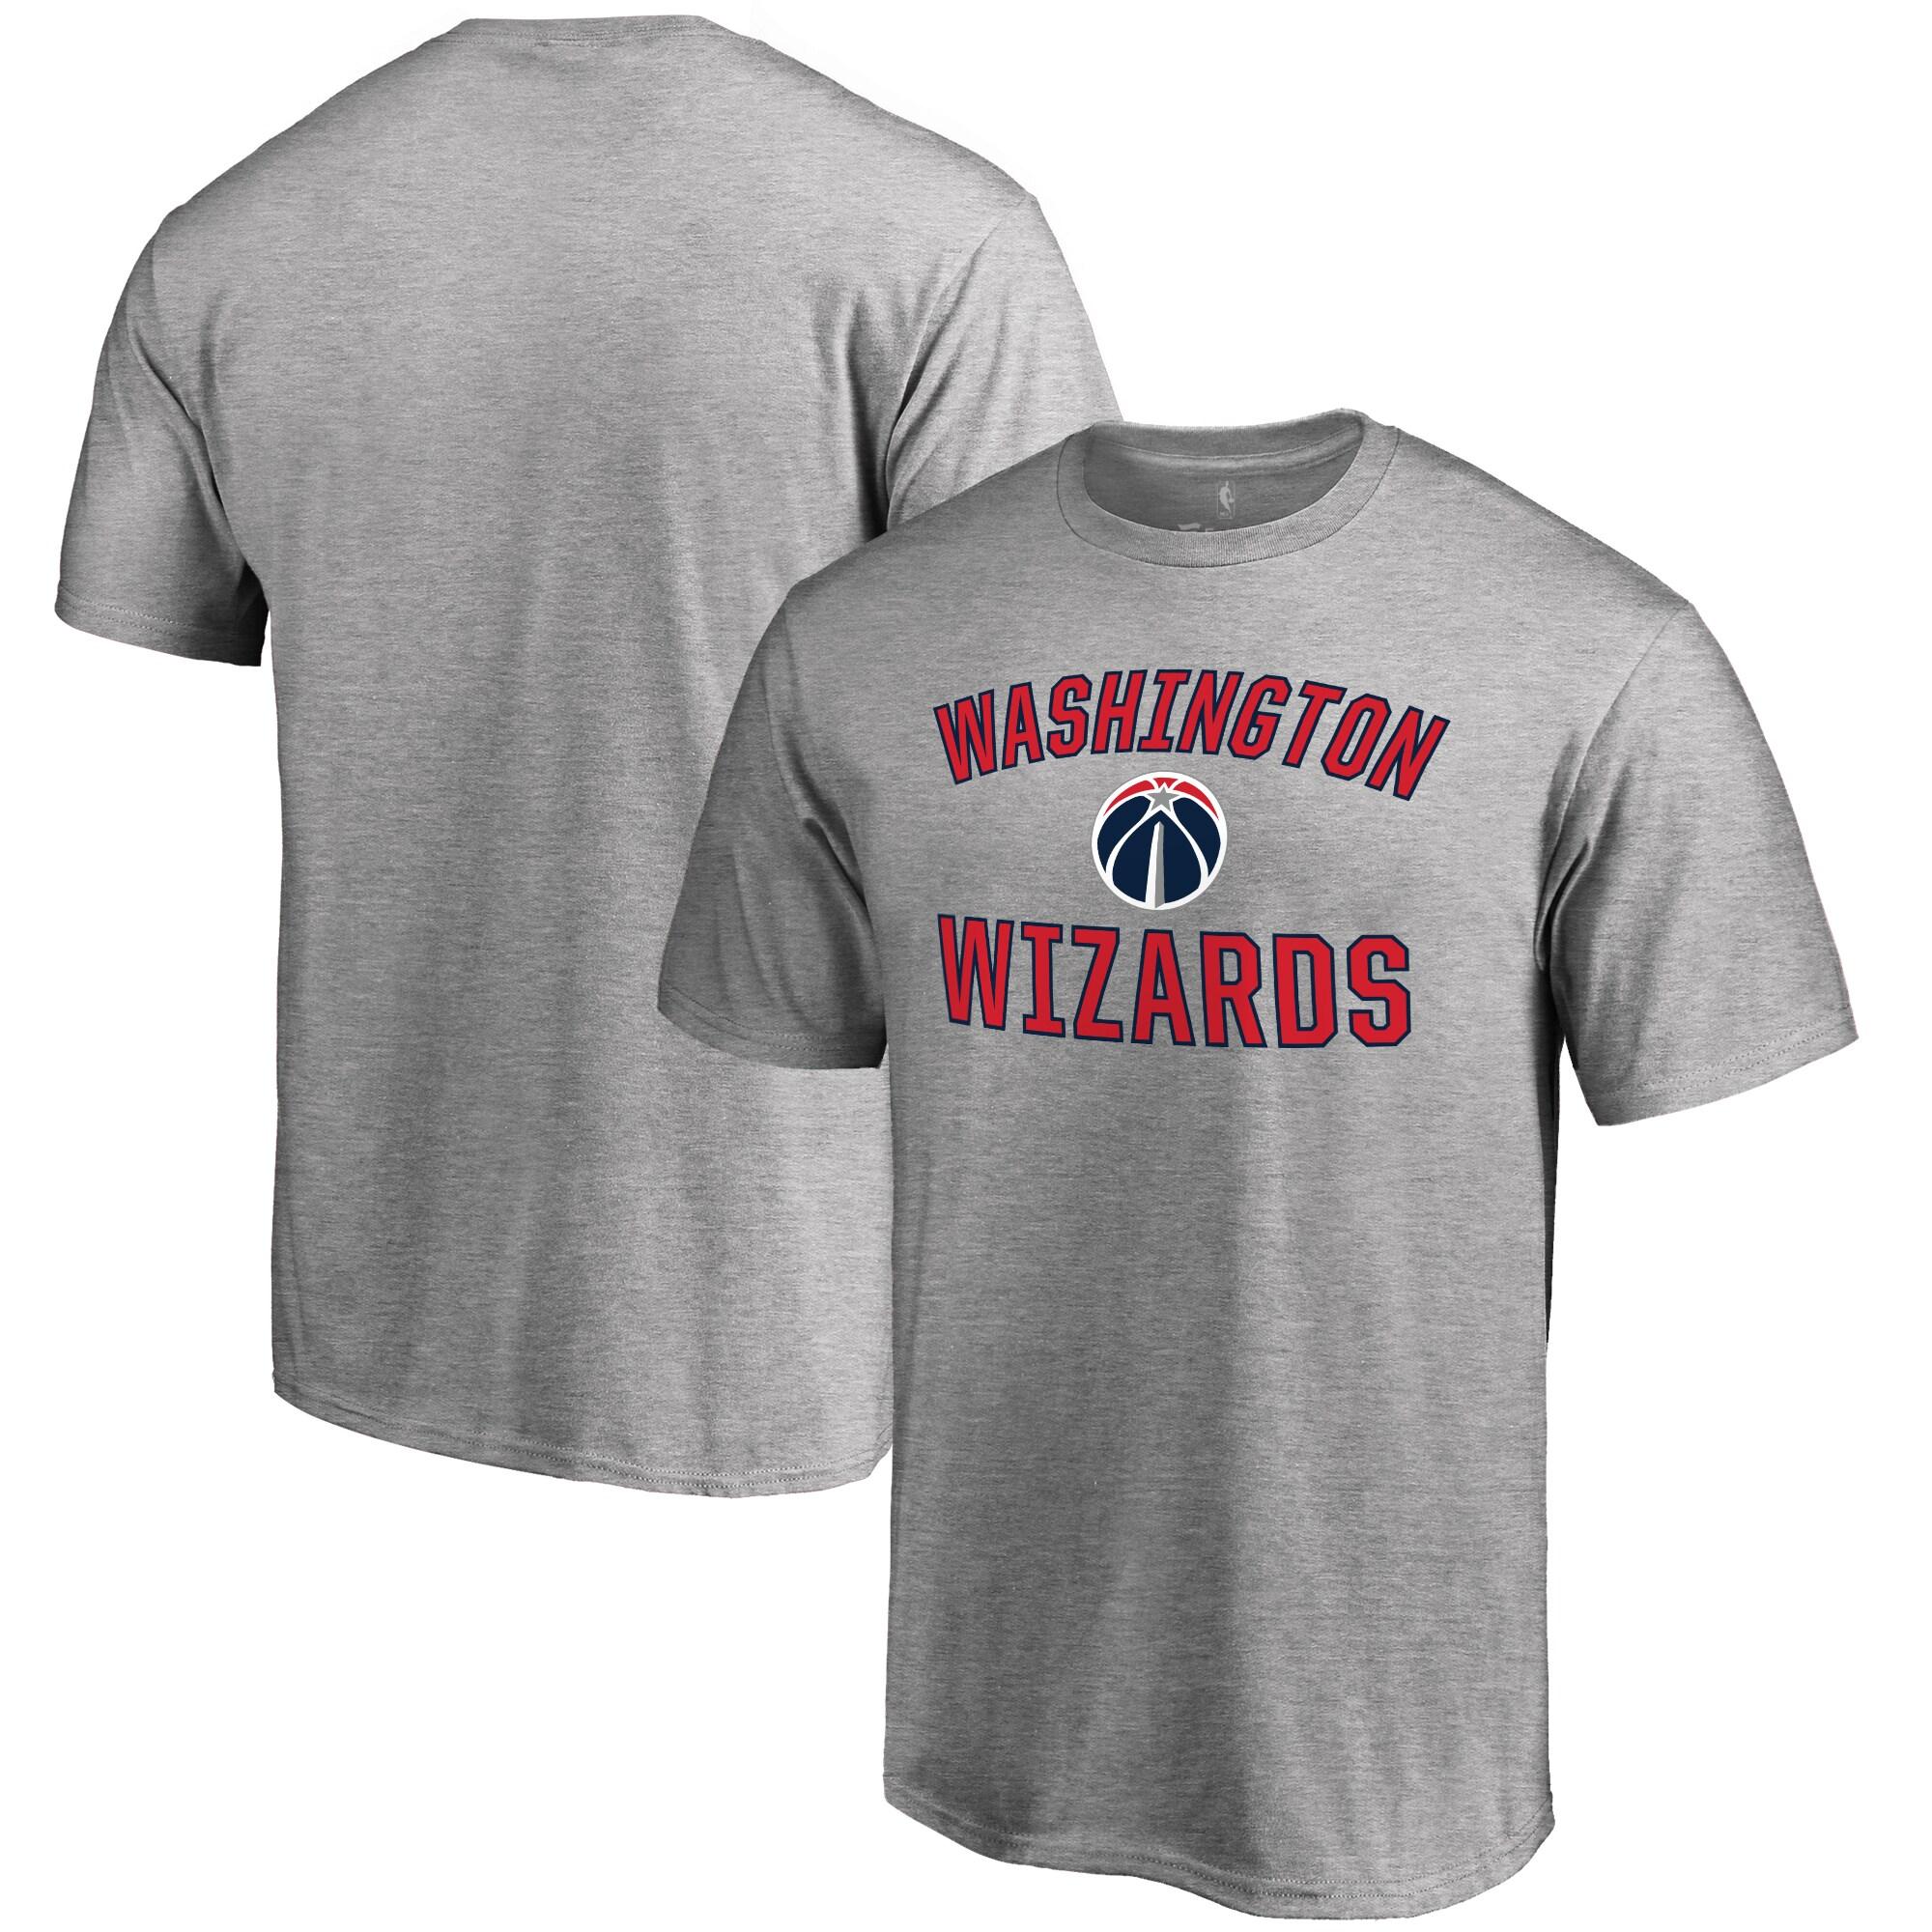 Washington Wizards Victory Arch T-Shirt - Ash